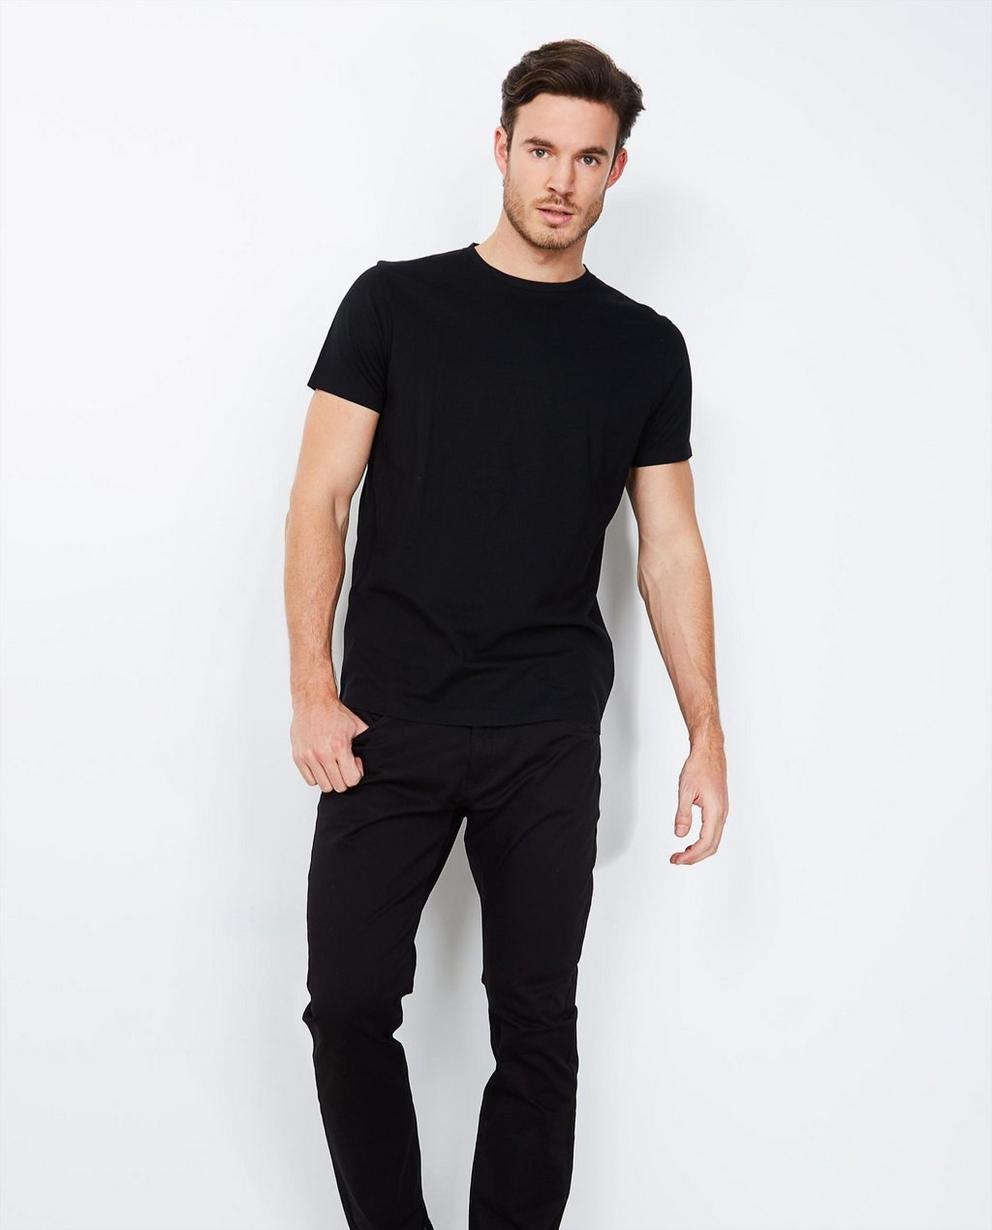 Pantalons - navy - Basic slim fit broek